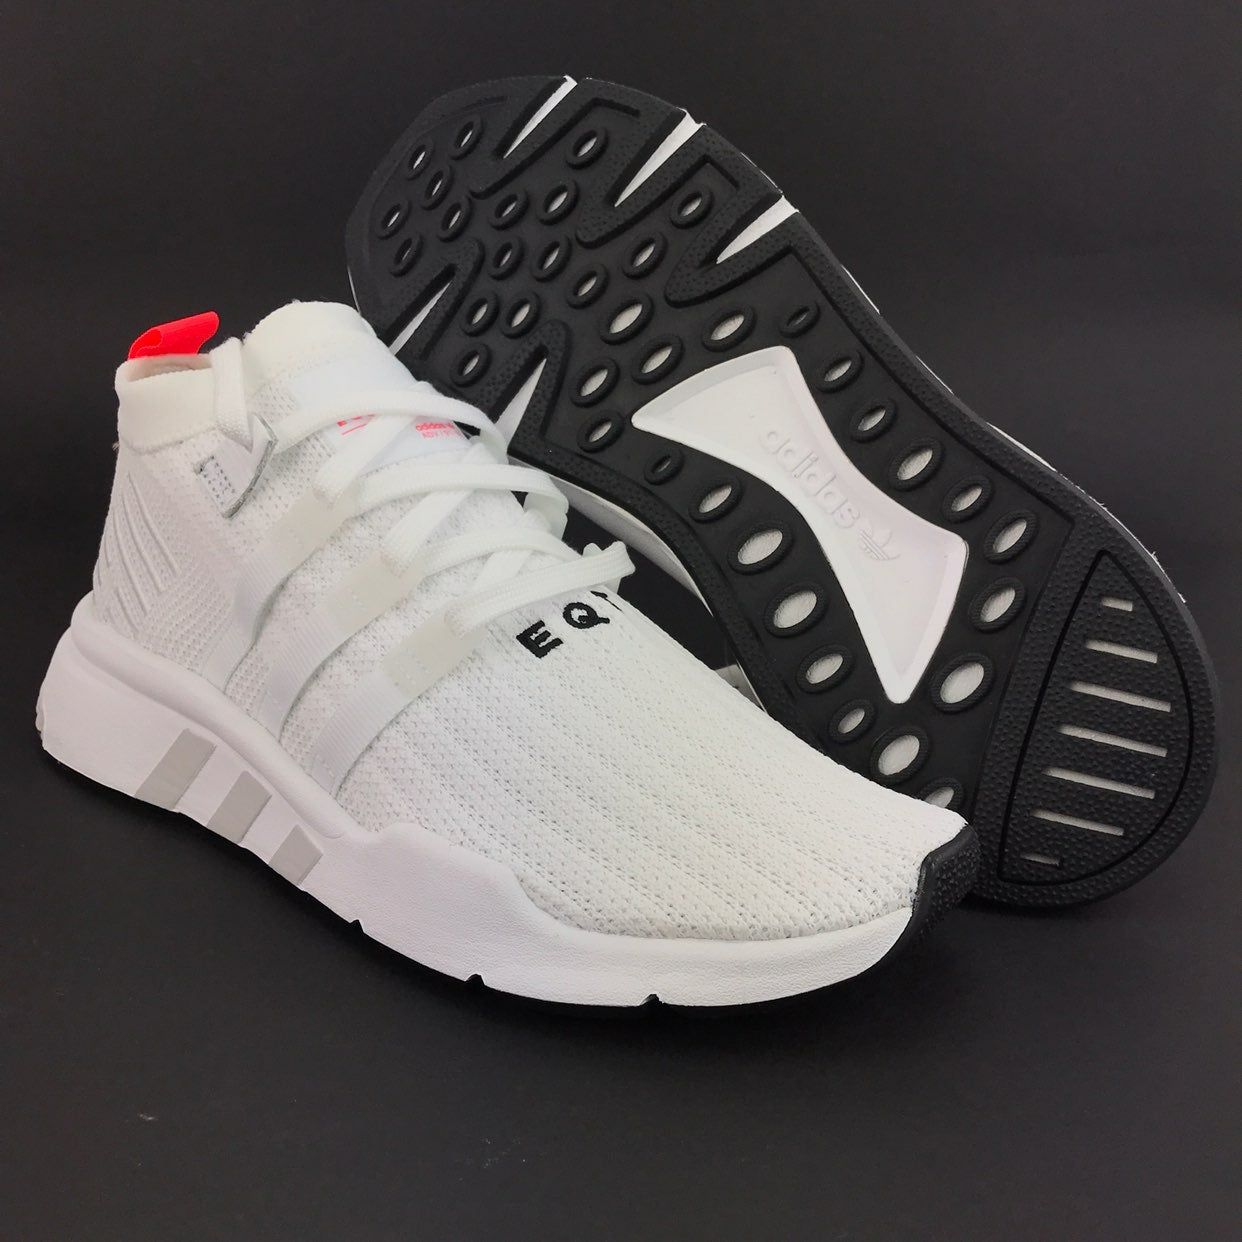 Adidas Men's EQT Support Mid ADV Primeknit White Running